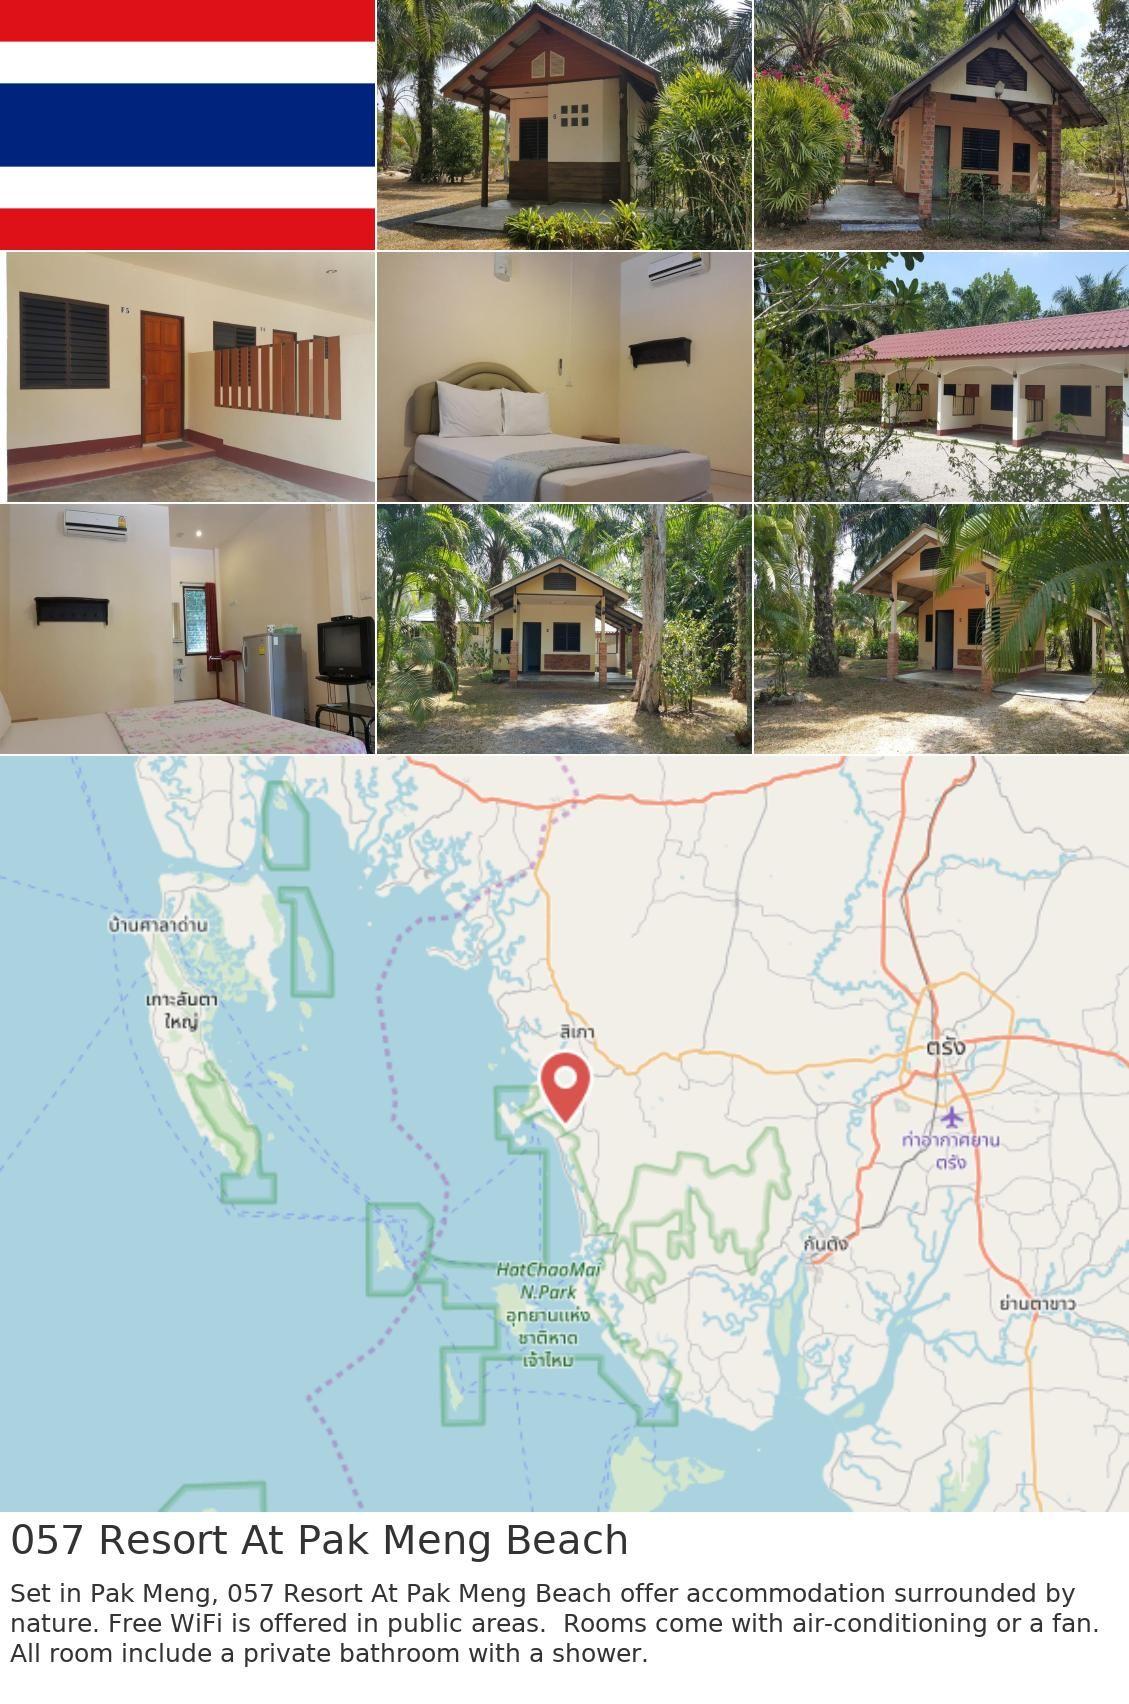 asia #thailand #ban pak meng 057 Resort At Pak Meng Beach